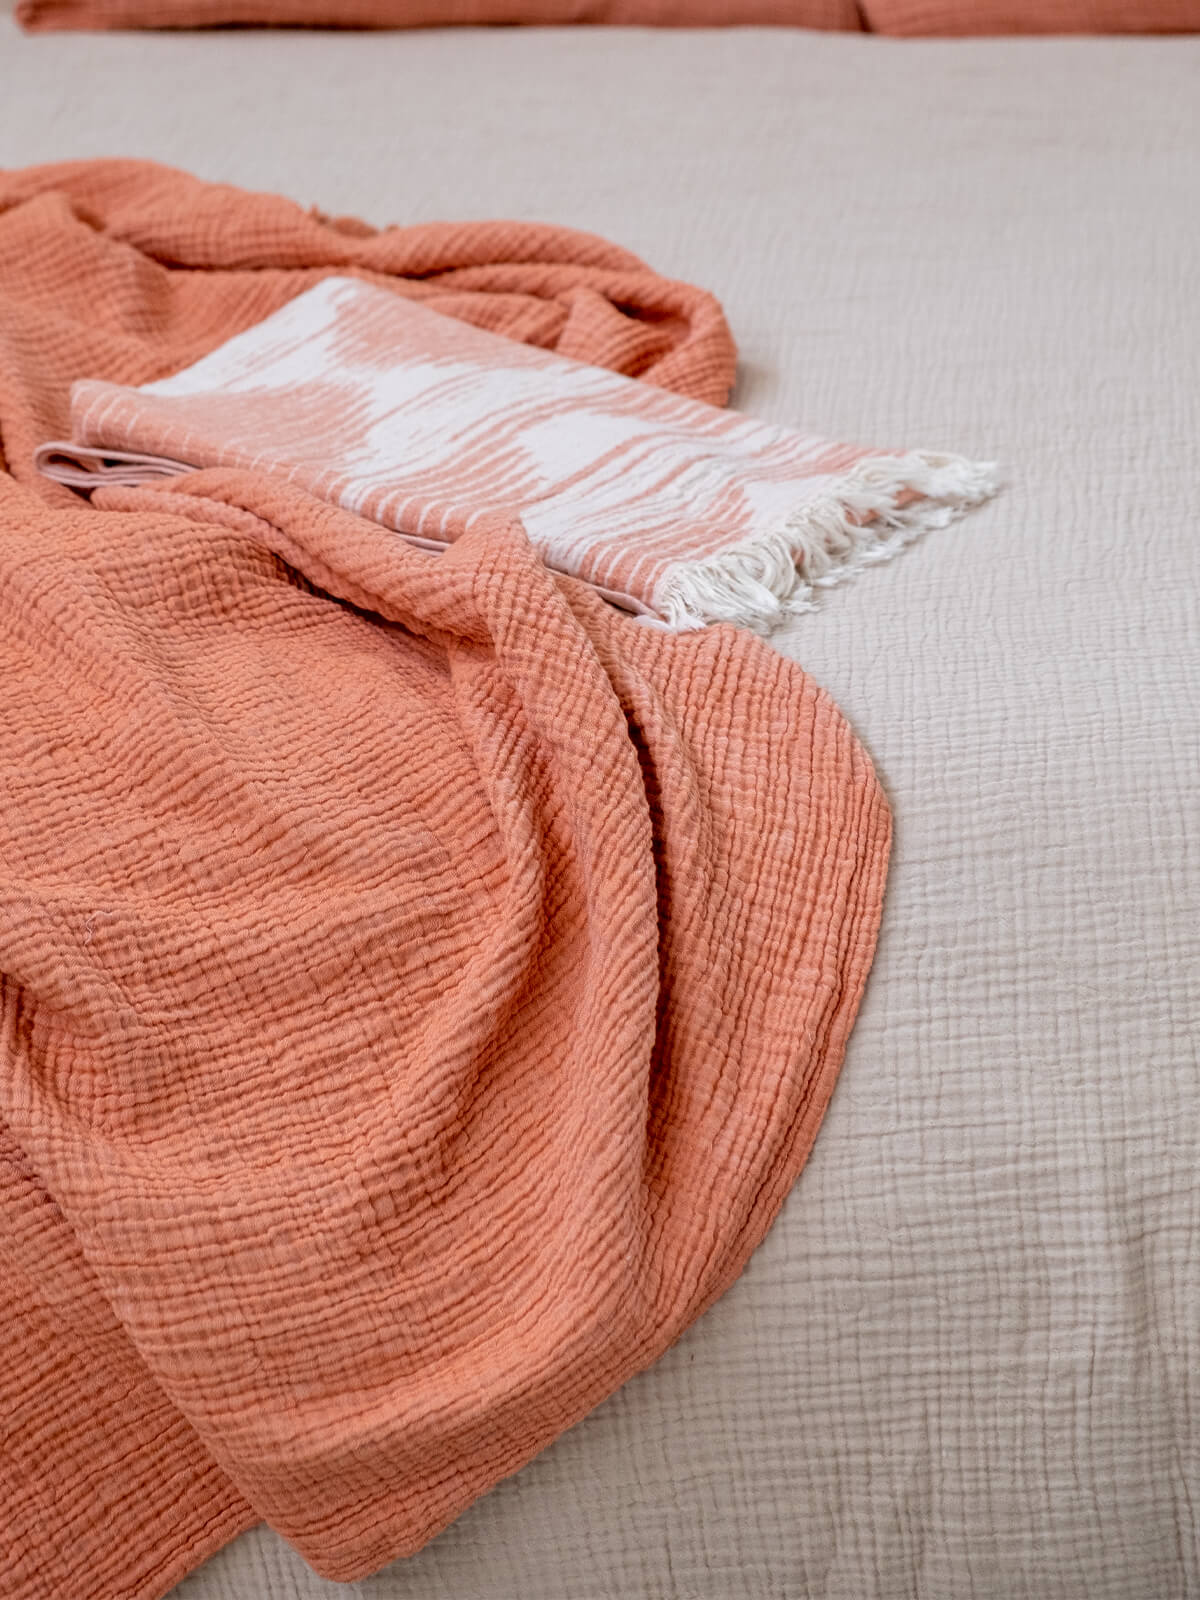 cocoon-koltuk-sali-apricot-gingersnap-1200×1600